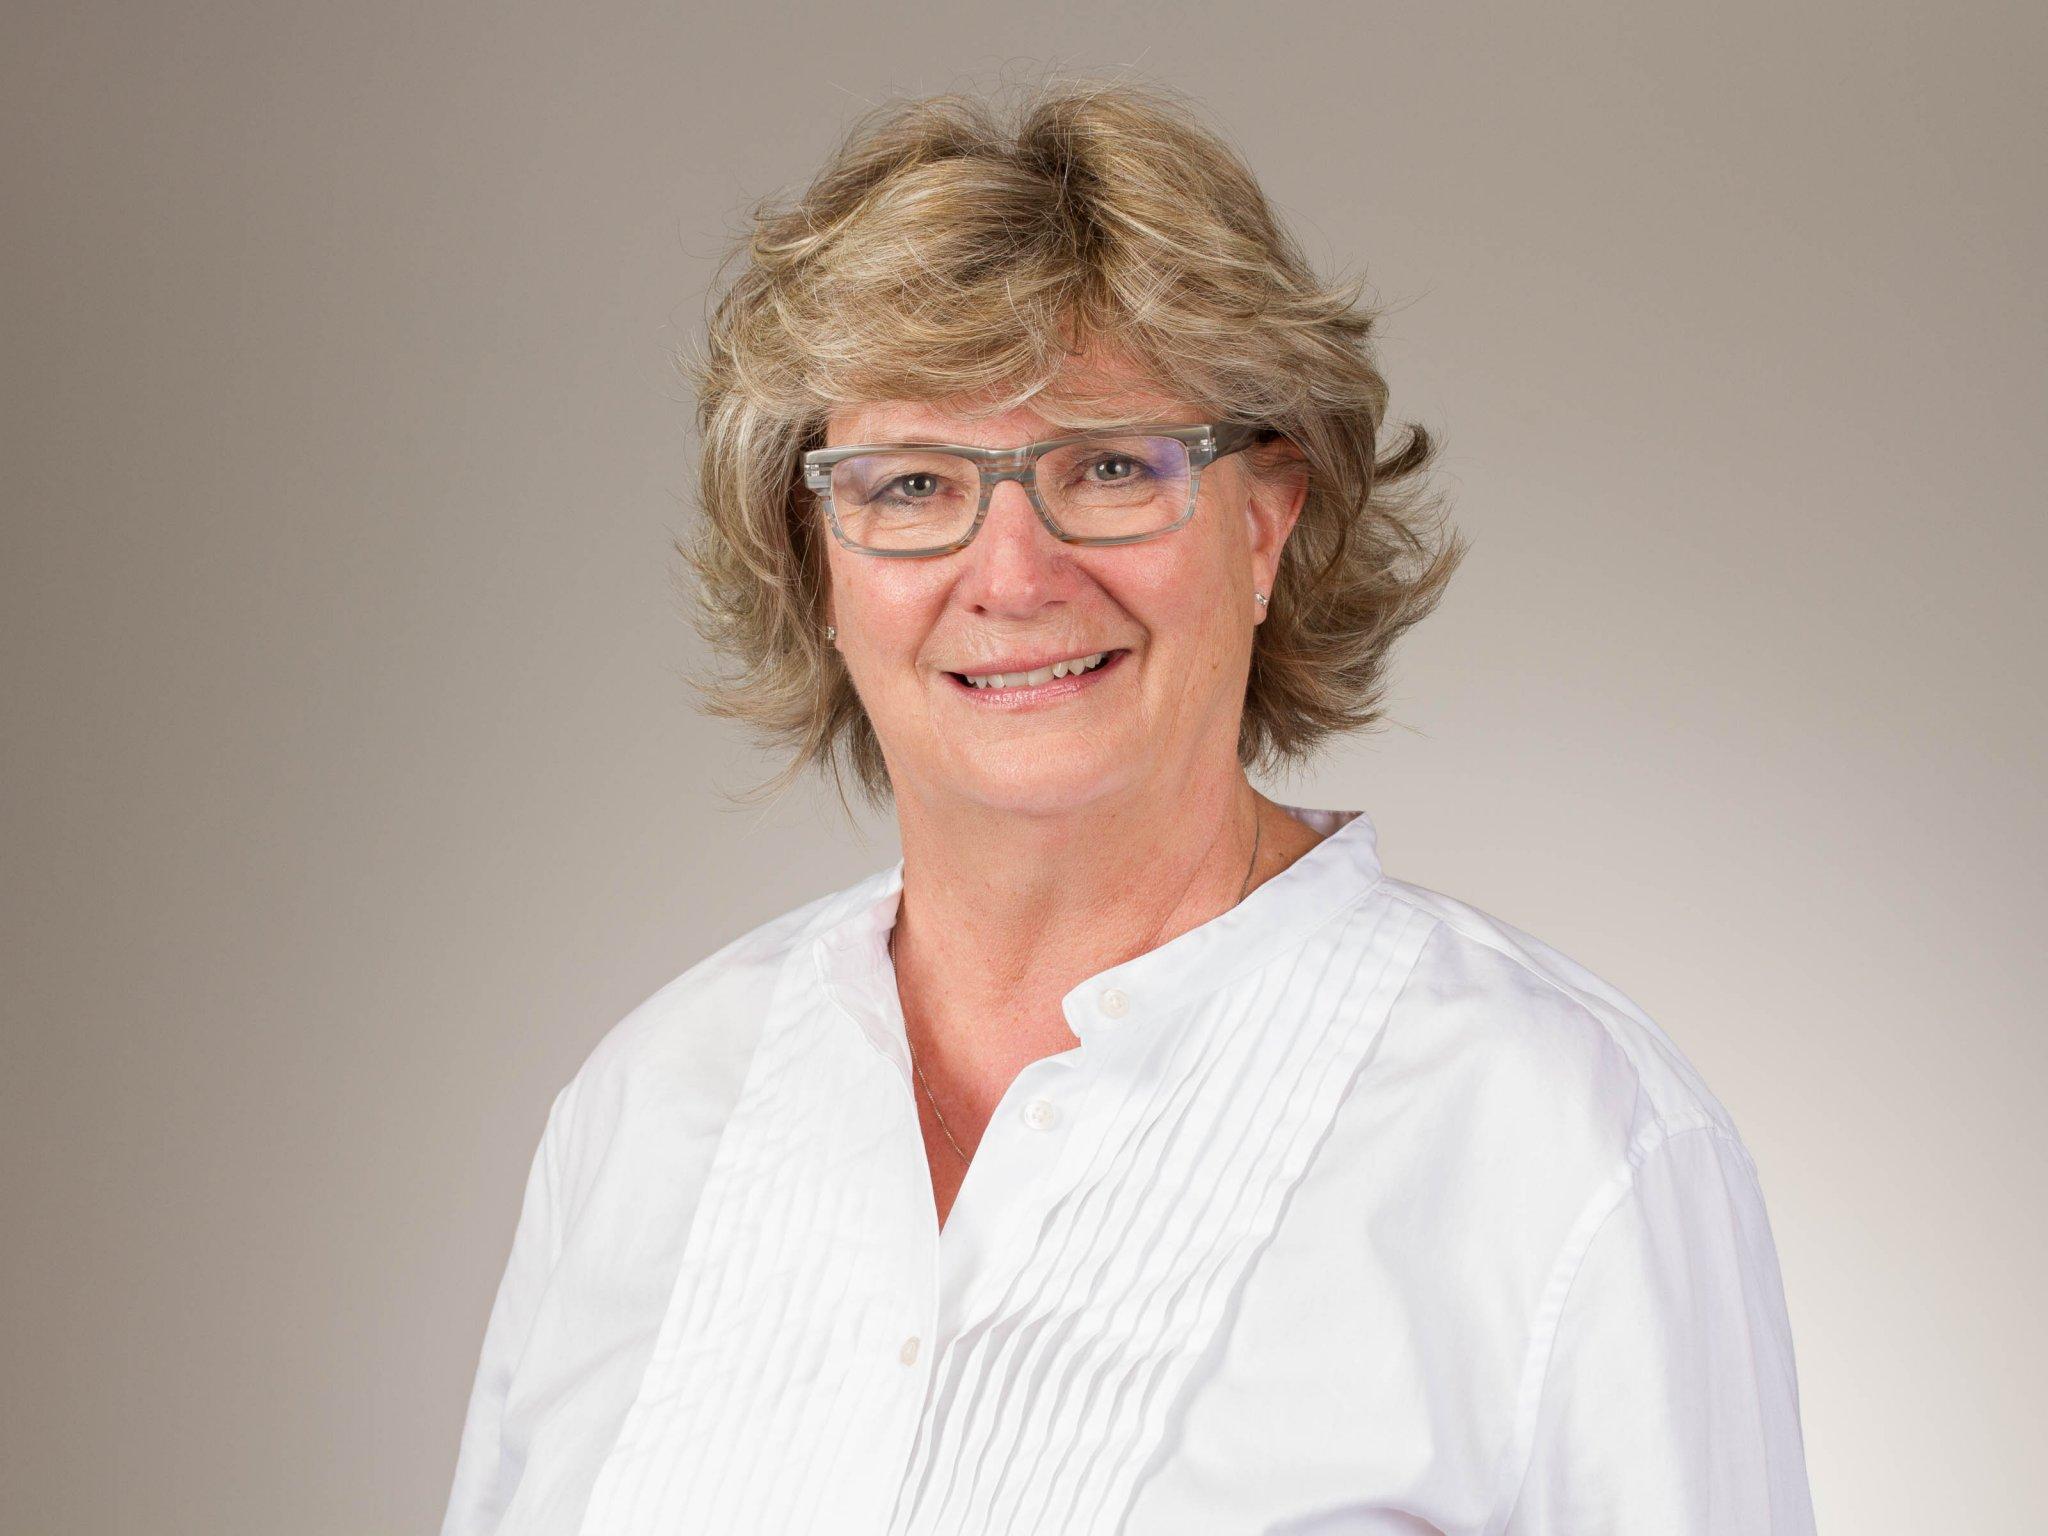 Dr. Carla Nelson